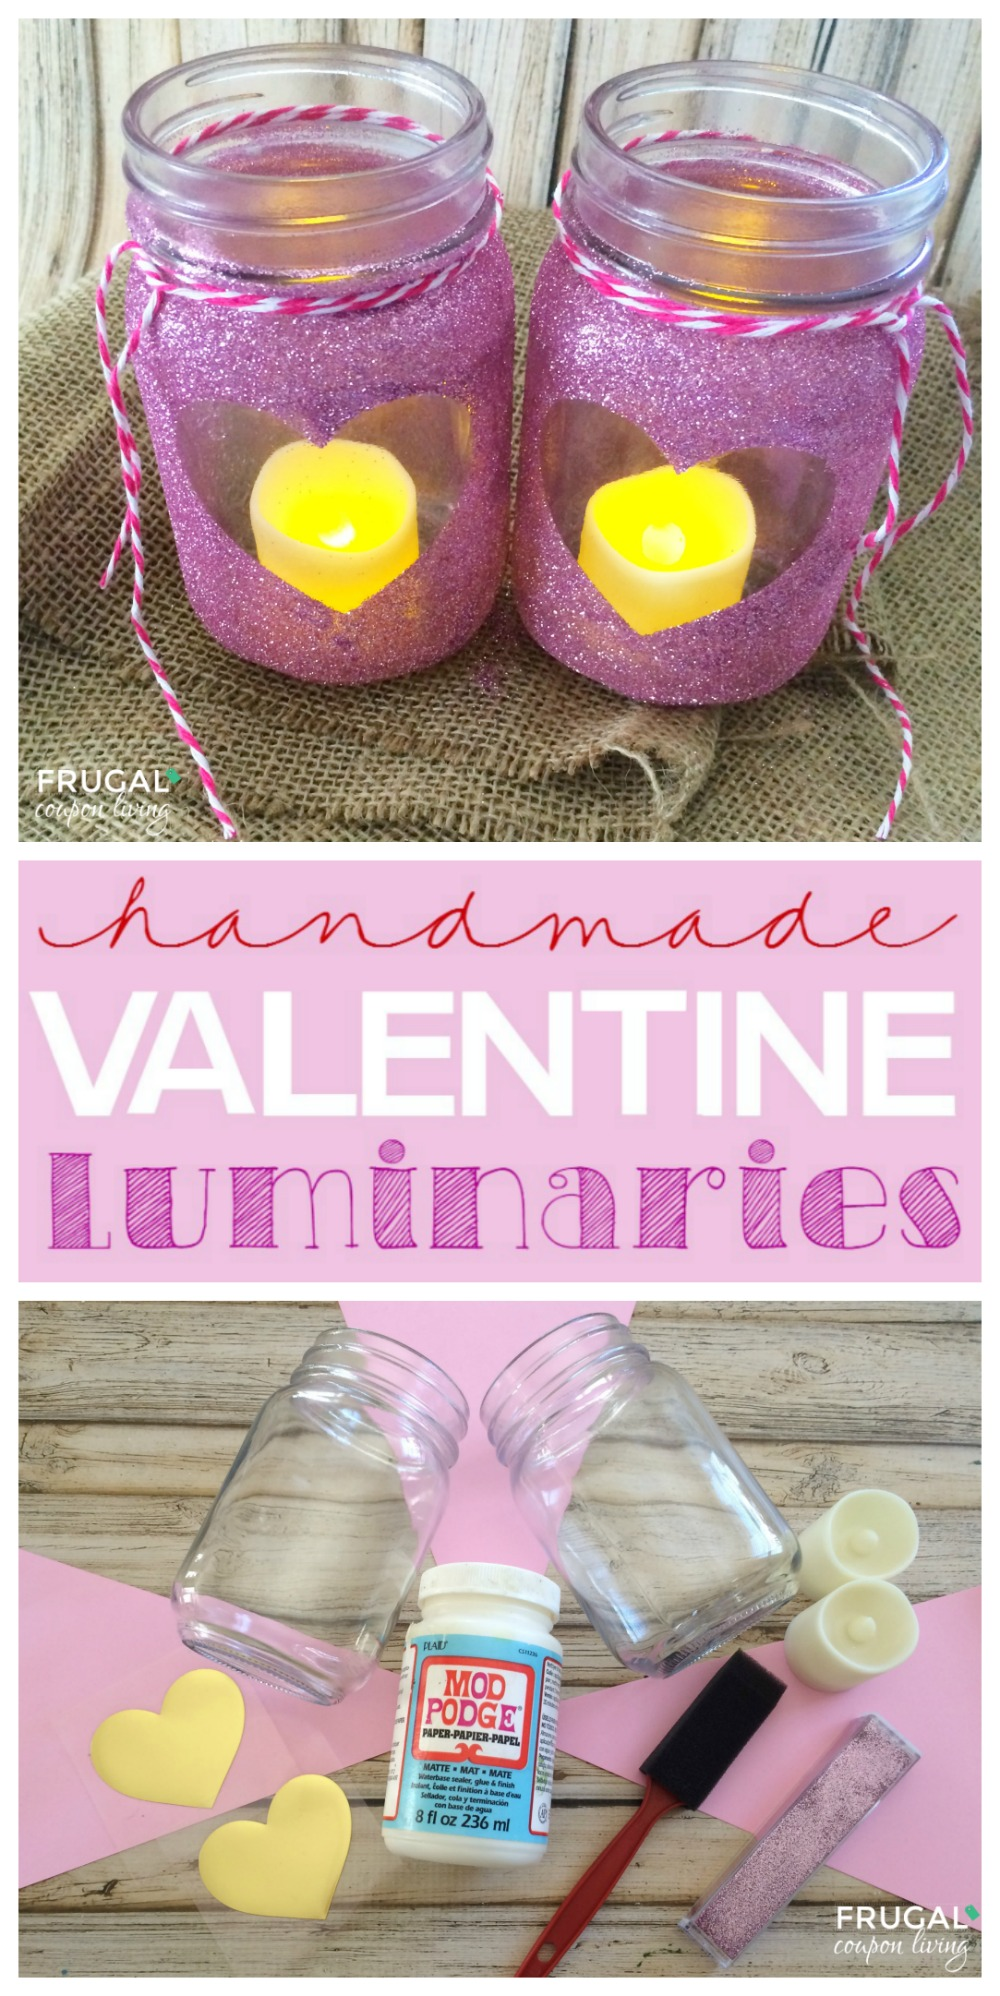 handmade-valentine-luminaries-frugal-coupon-living